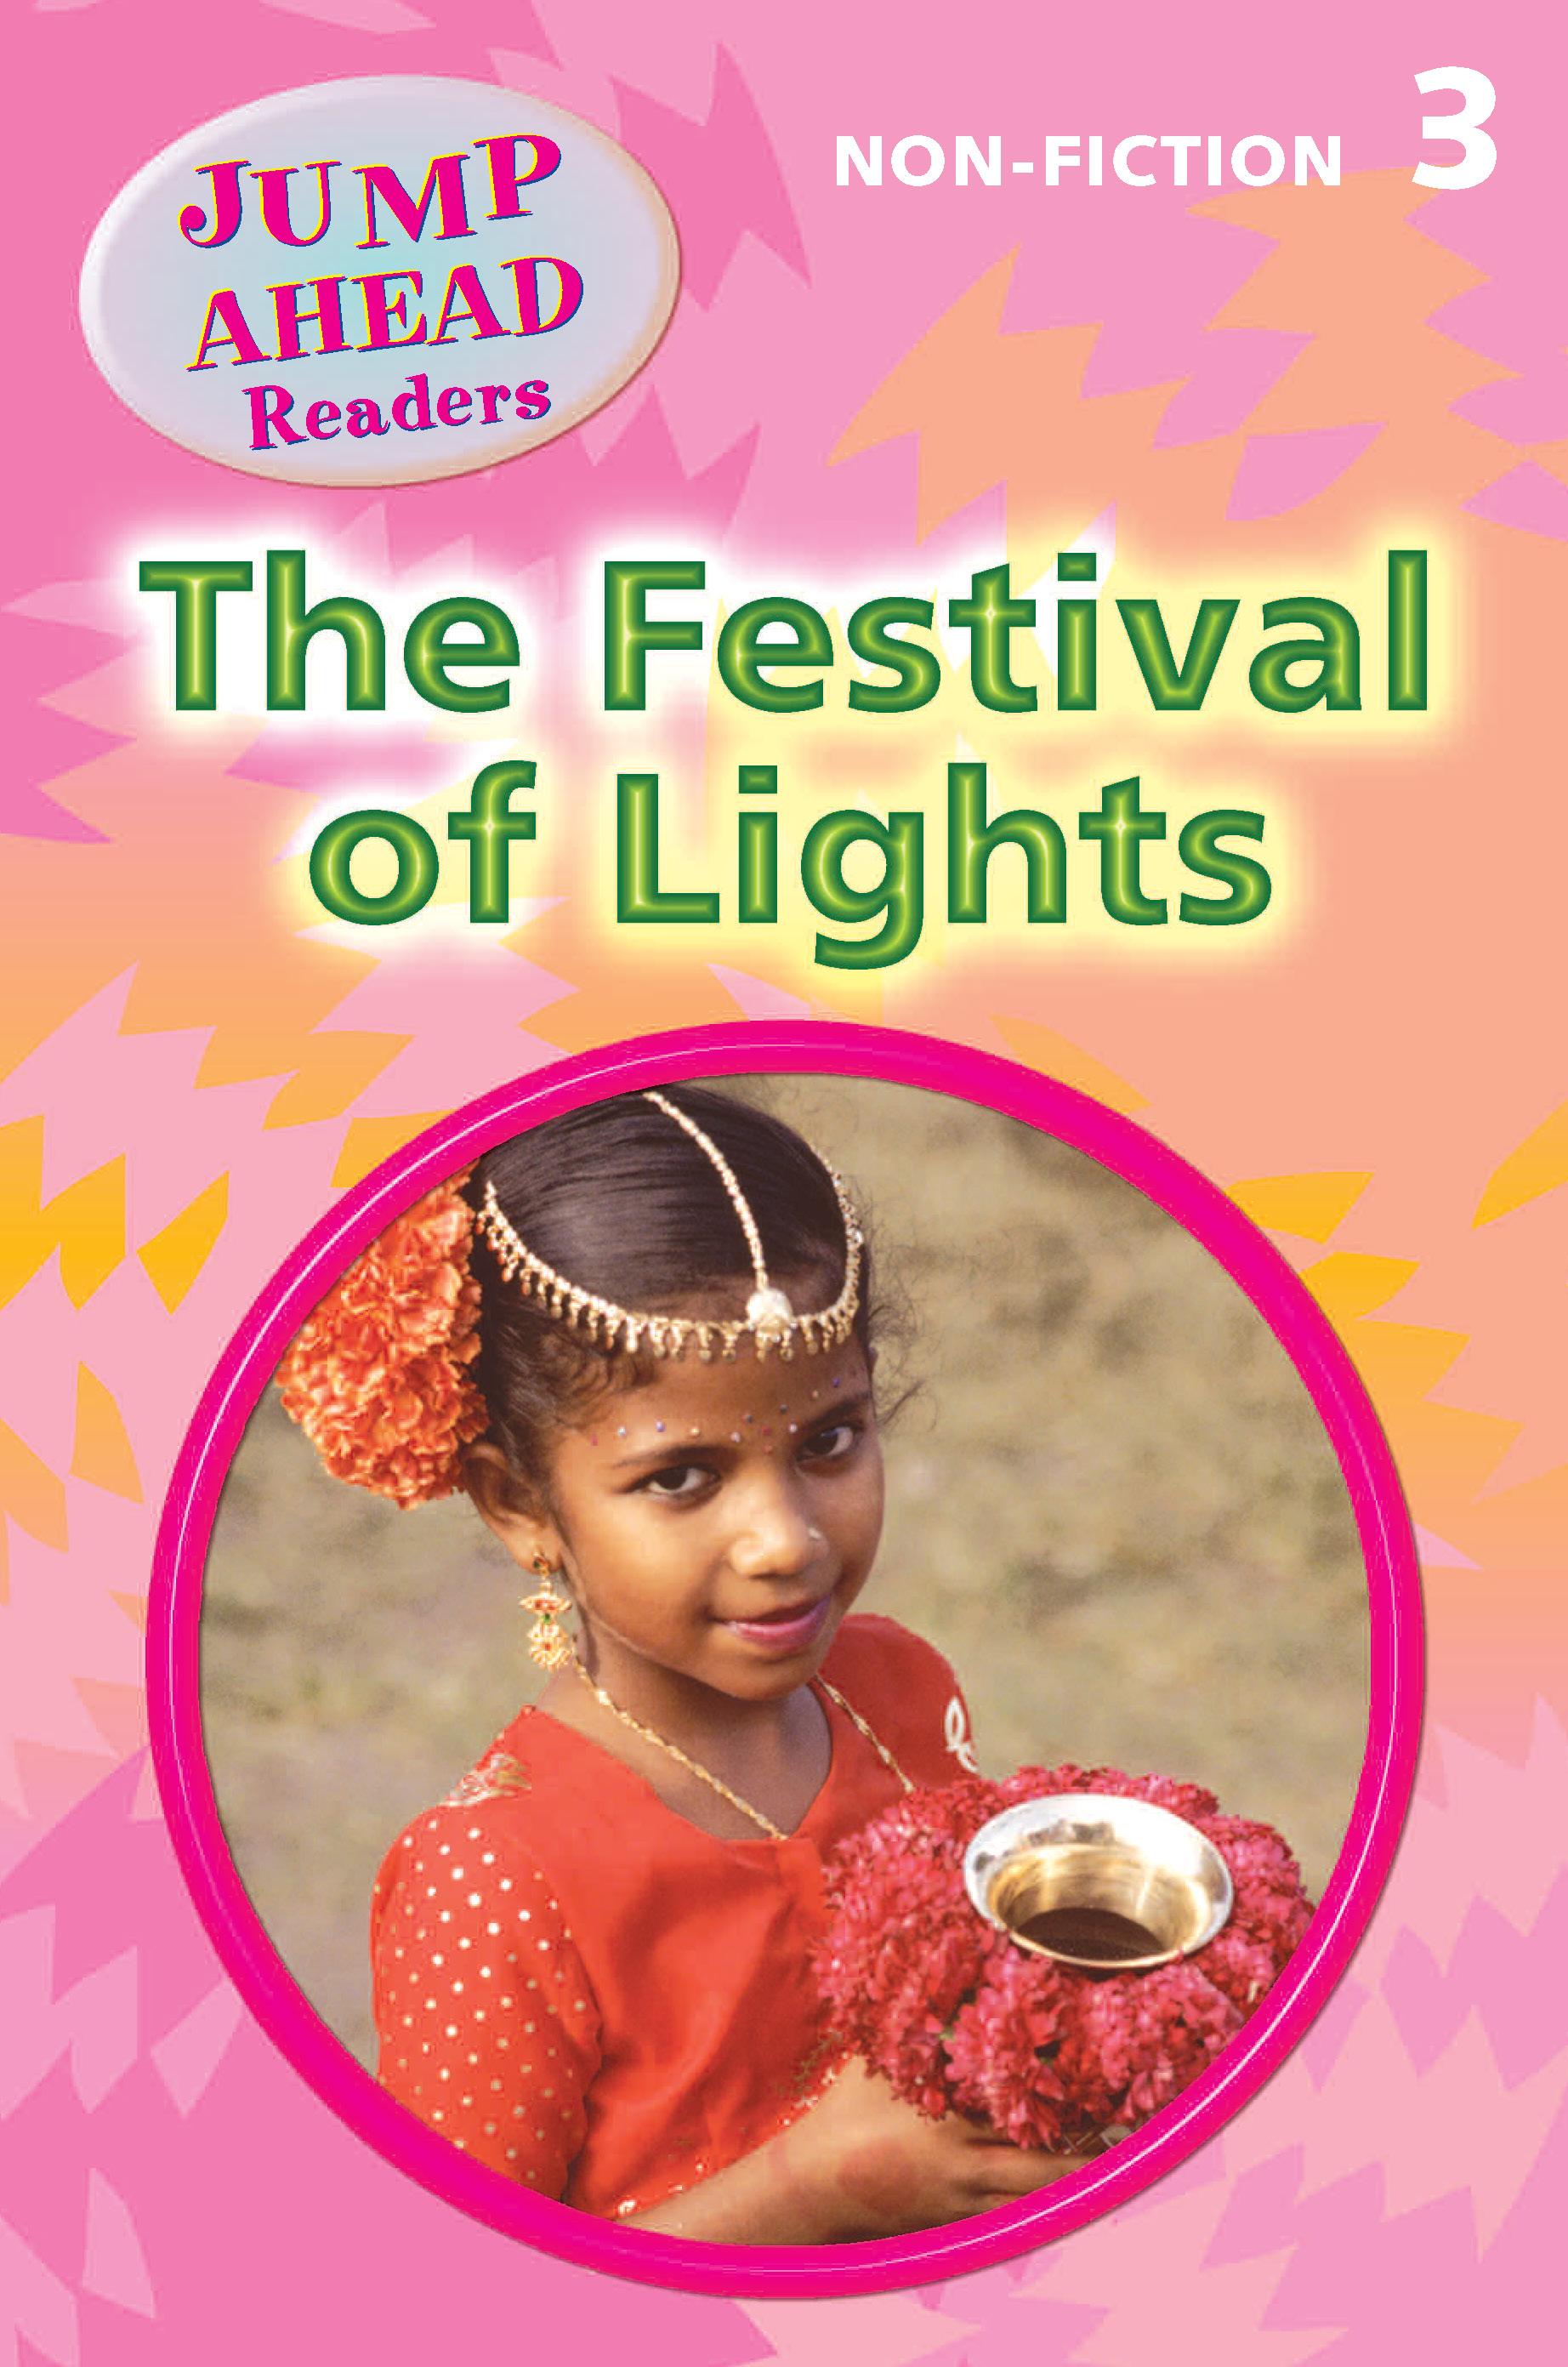 Jump Ahead Readers The Festival of Lights